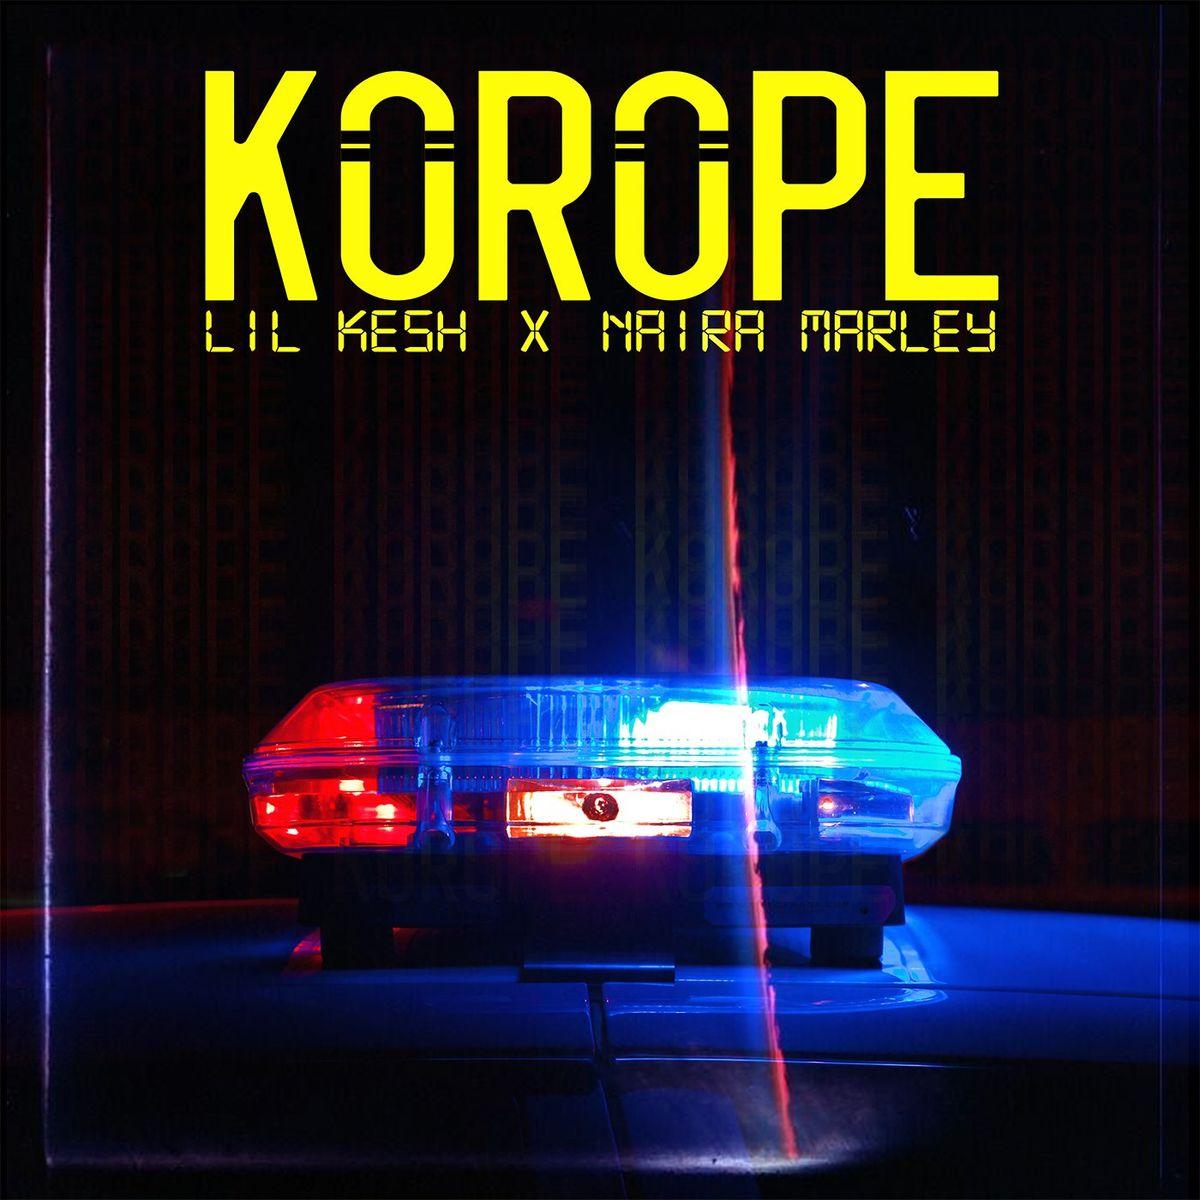 Korope CD 1 TRACK 1 128 mp3 image